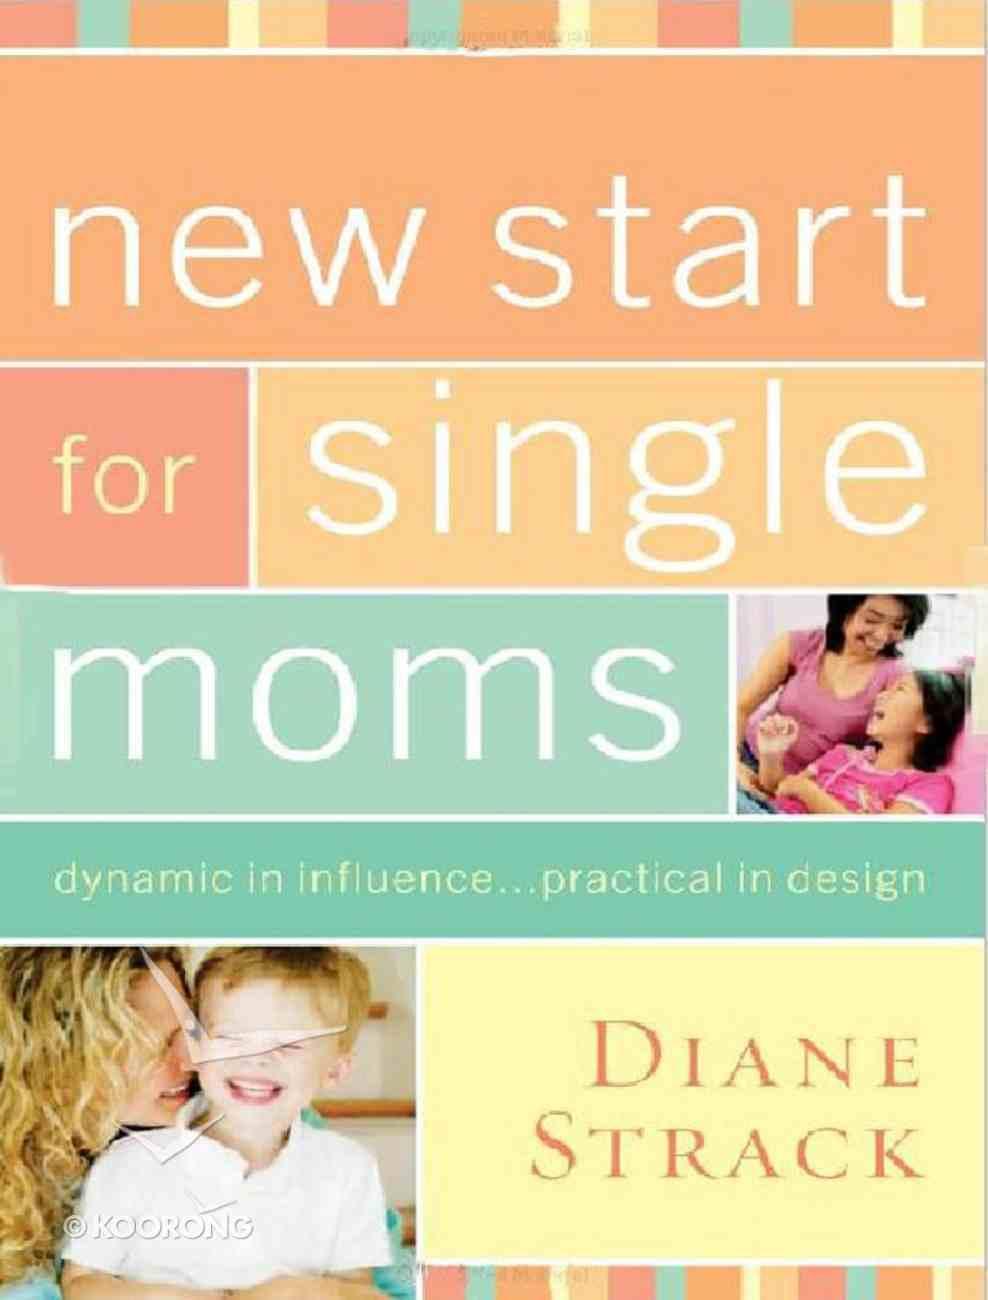 New Start For Single Moms Facilitator's Guide eBook